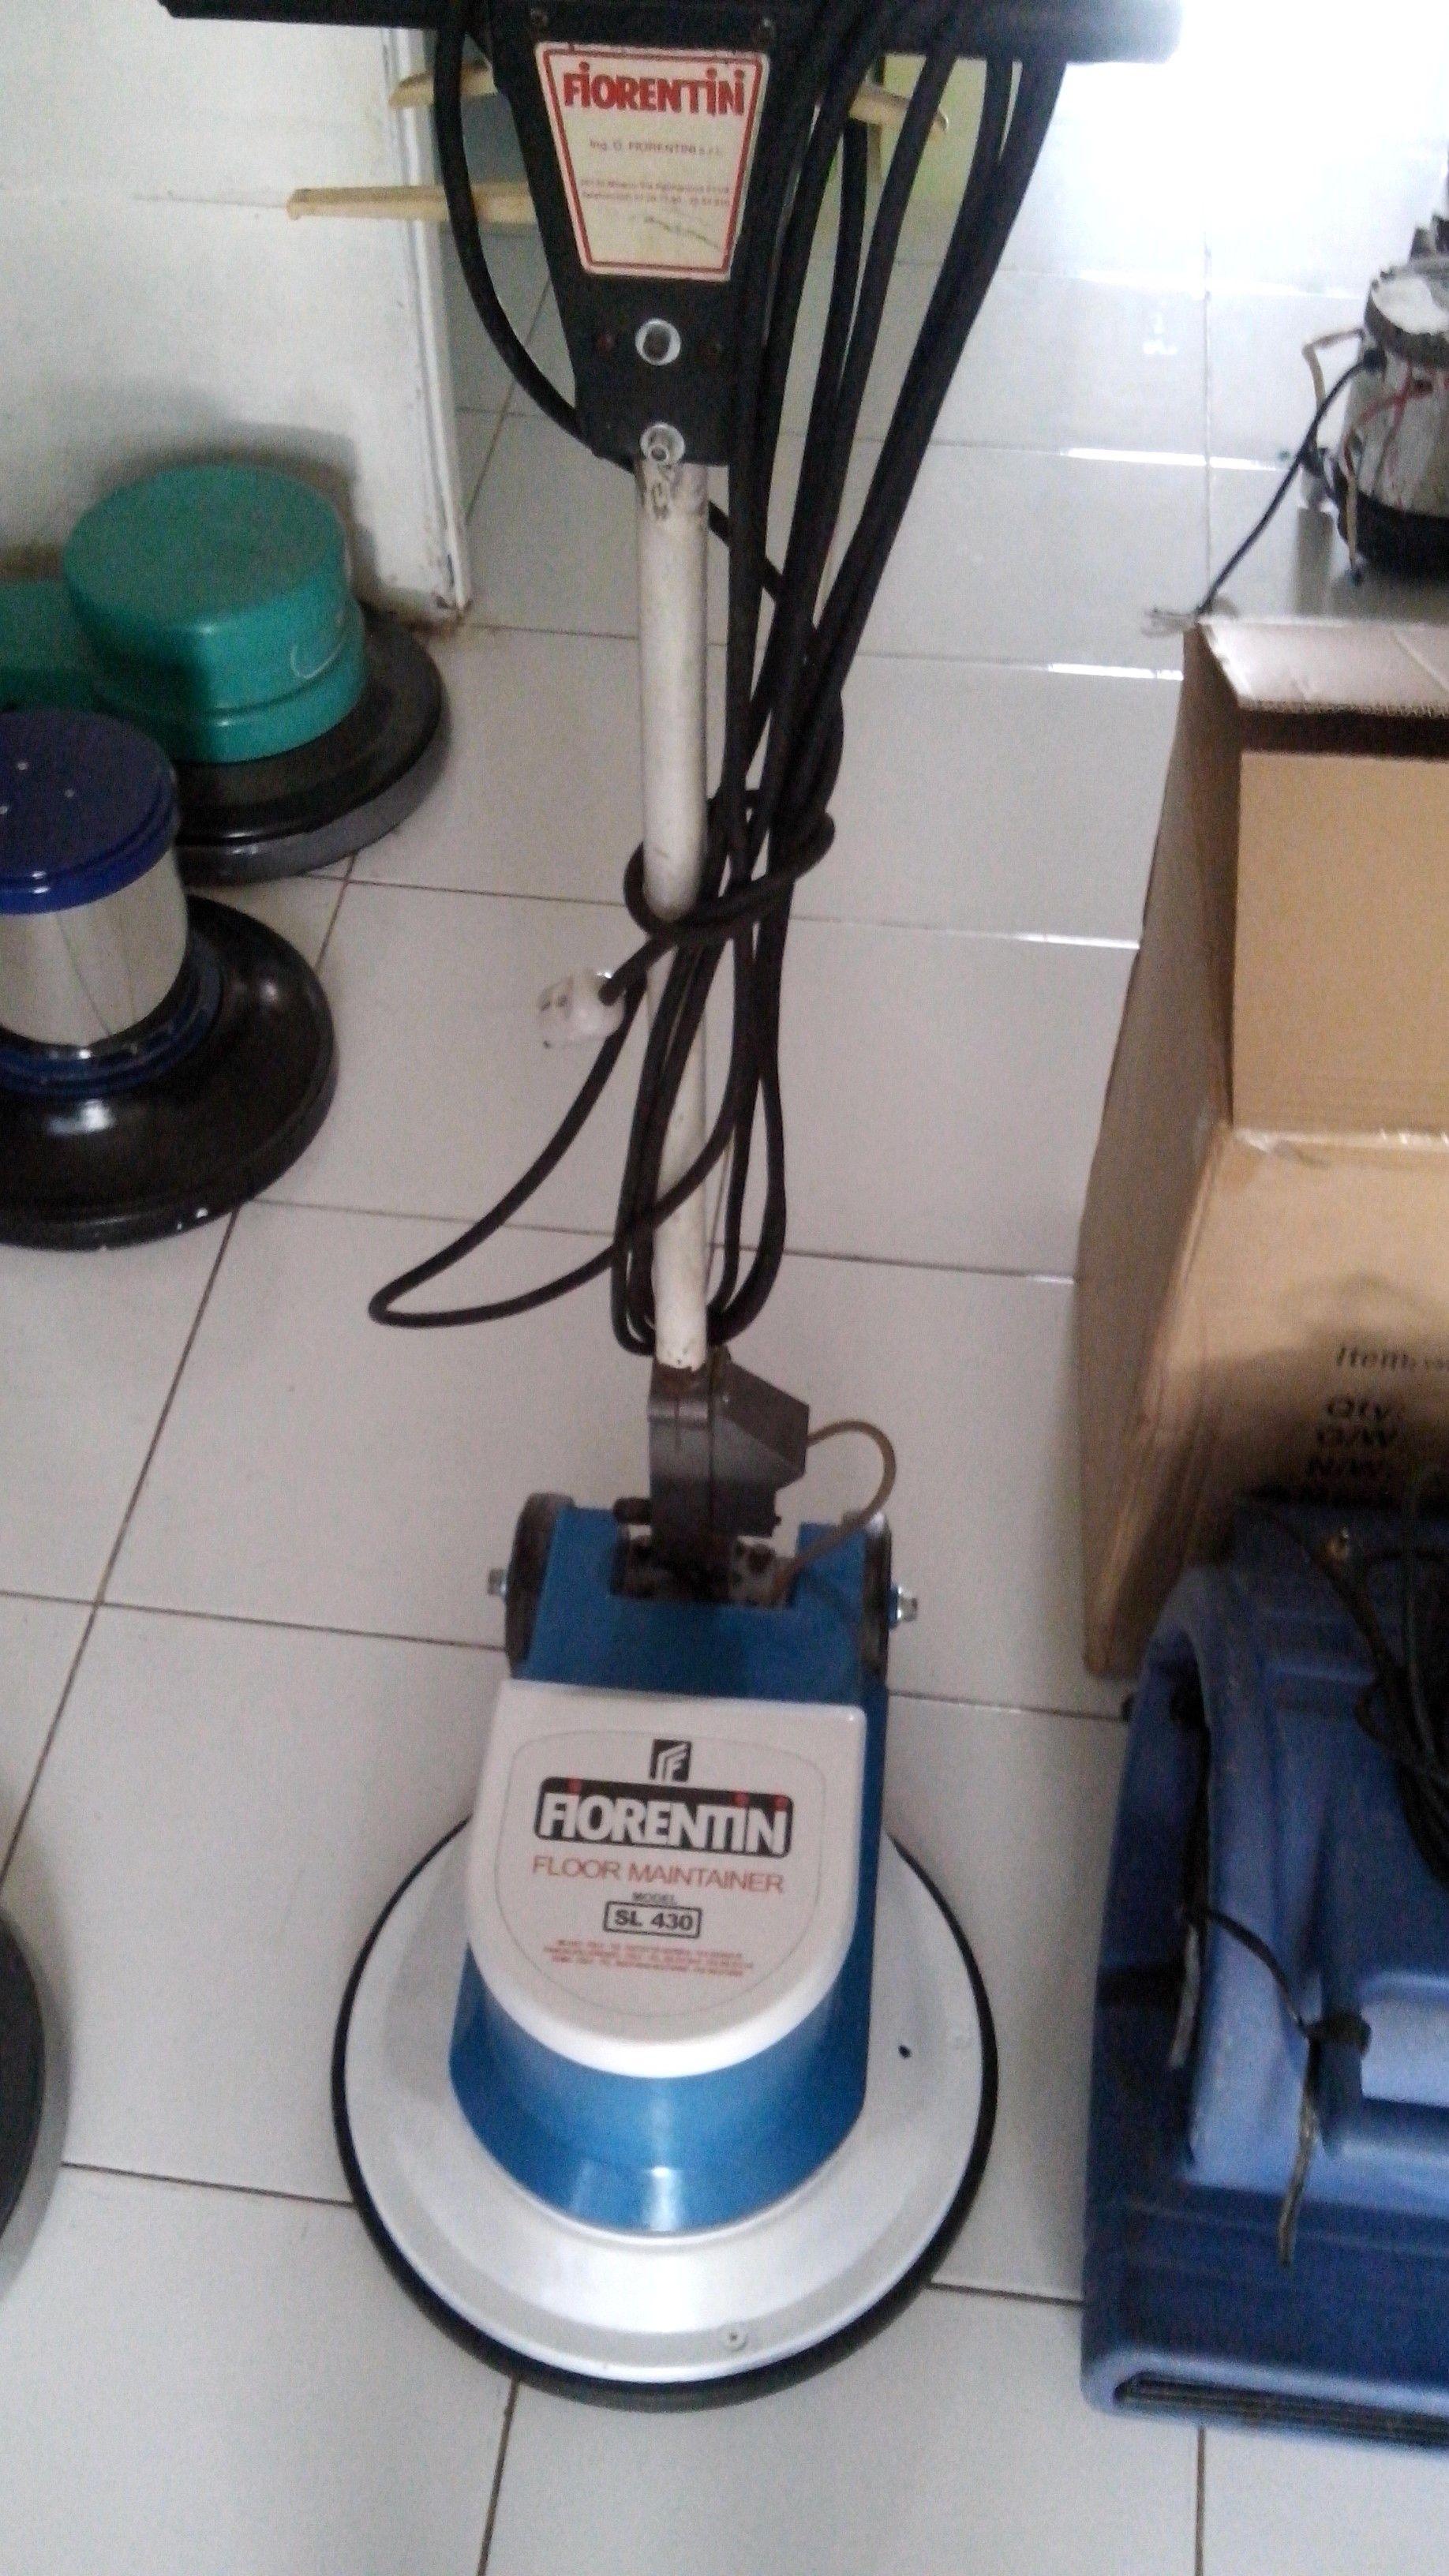 Jual Mesin Polisher Lantai Second Floor Polisher Fiorentini Sl 430 Spesifikasi Model Sl 430 Power 1200 Watt Diameter 17 Inch Speed 175 Rpm Lantai